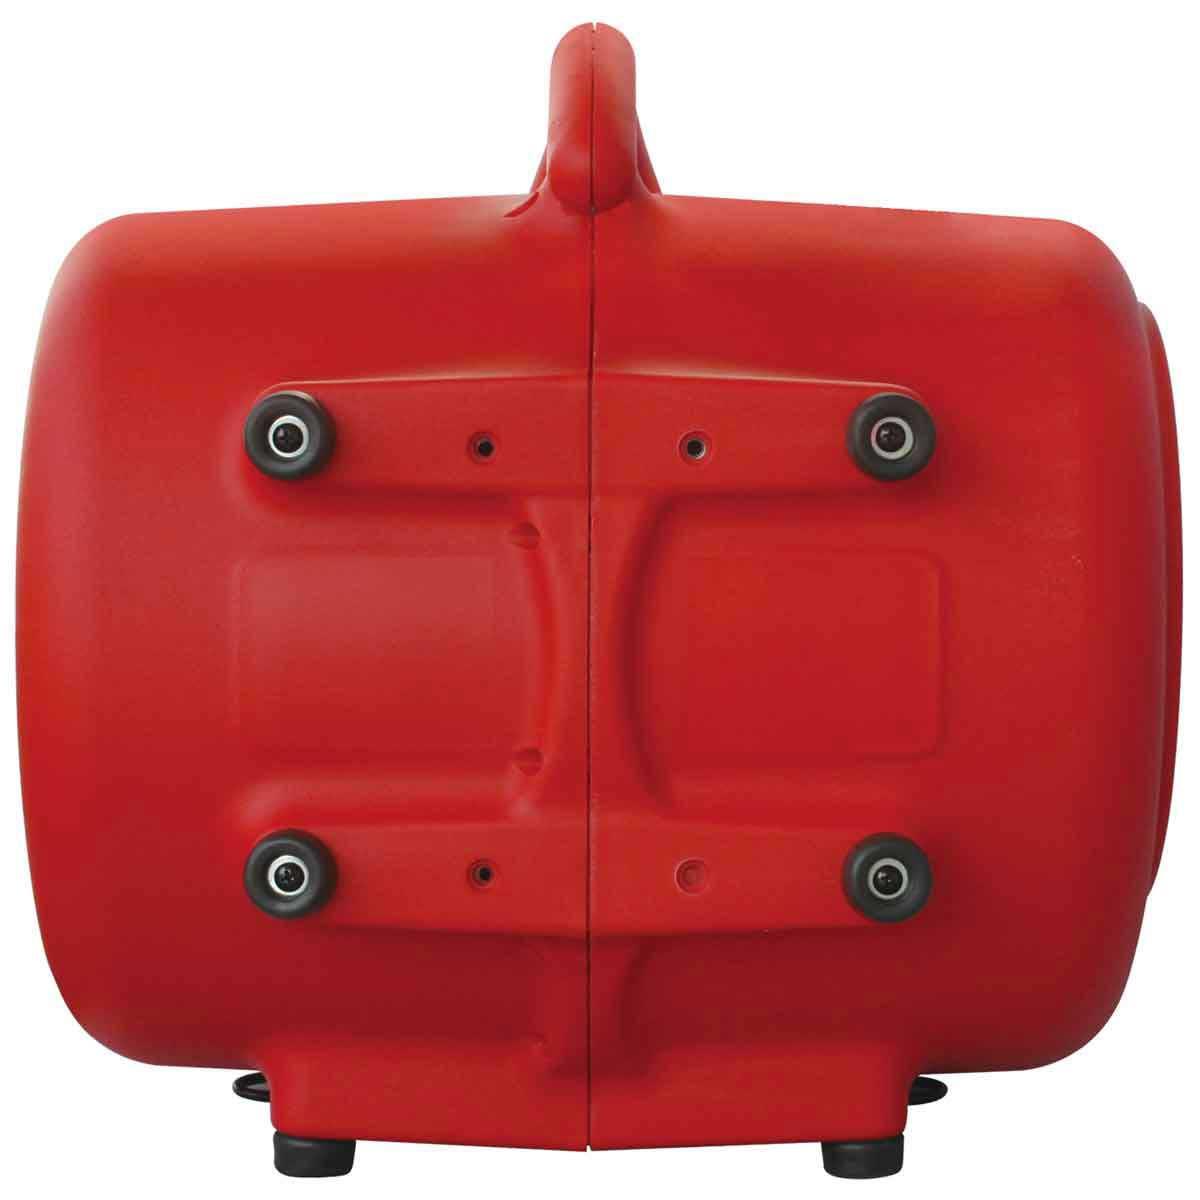 Hawk Air Mover ventilator up